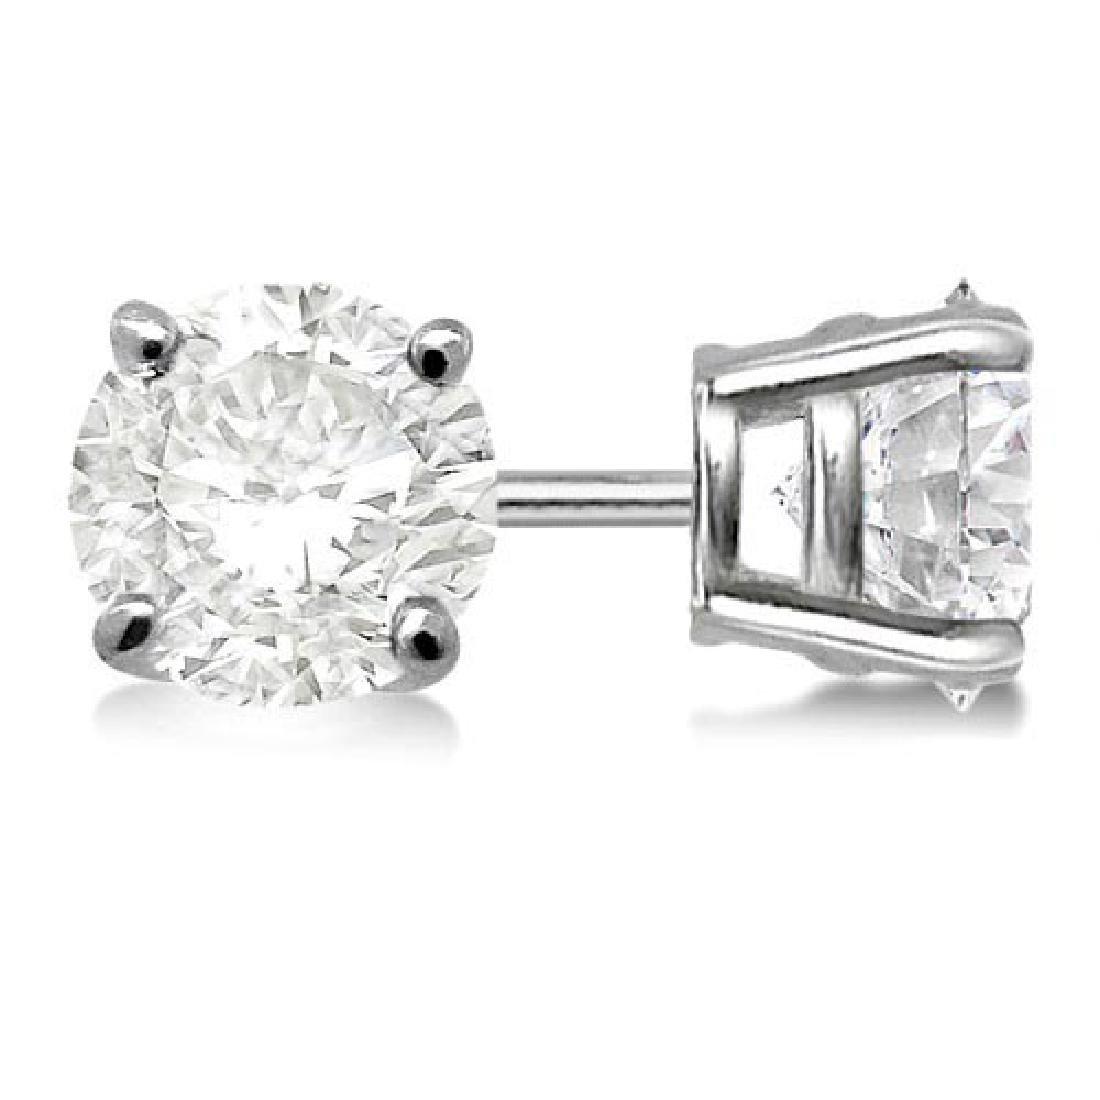 Certified 1.01 CTW Round Diamond Stud Earrings J/SI3